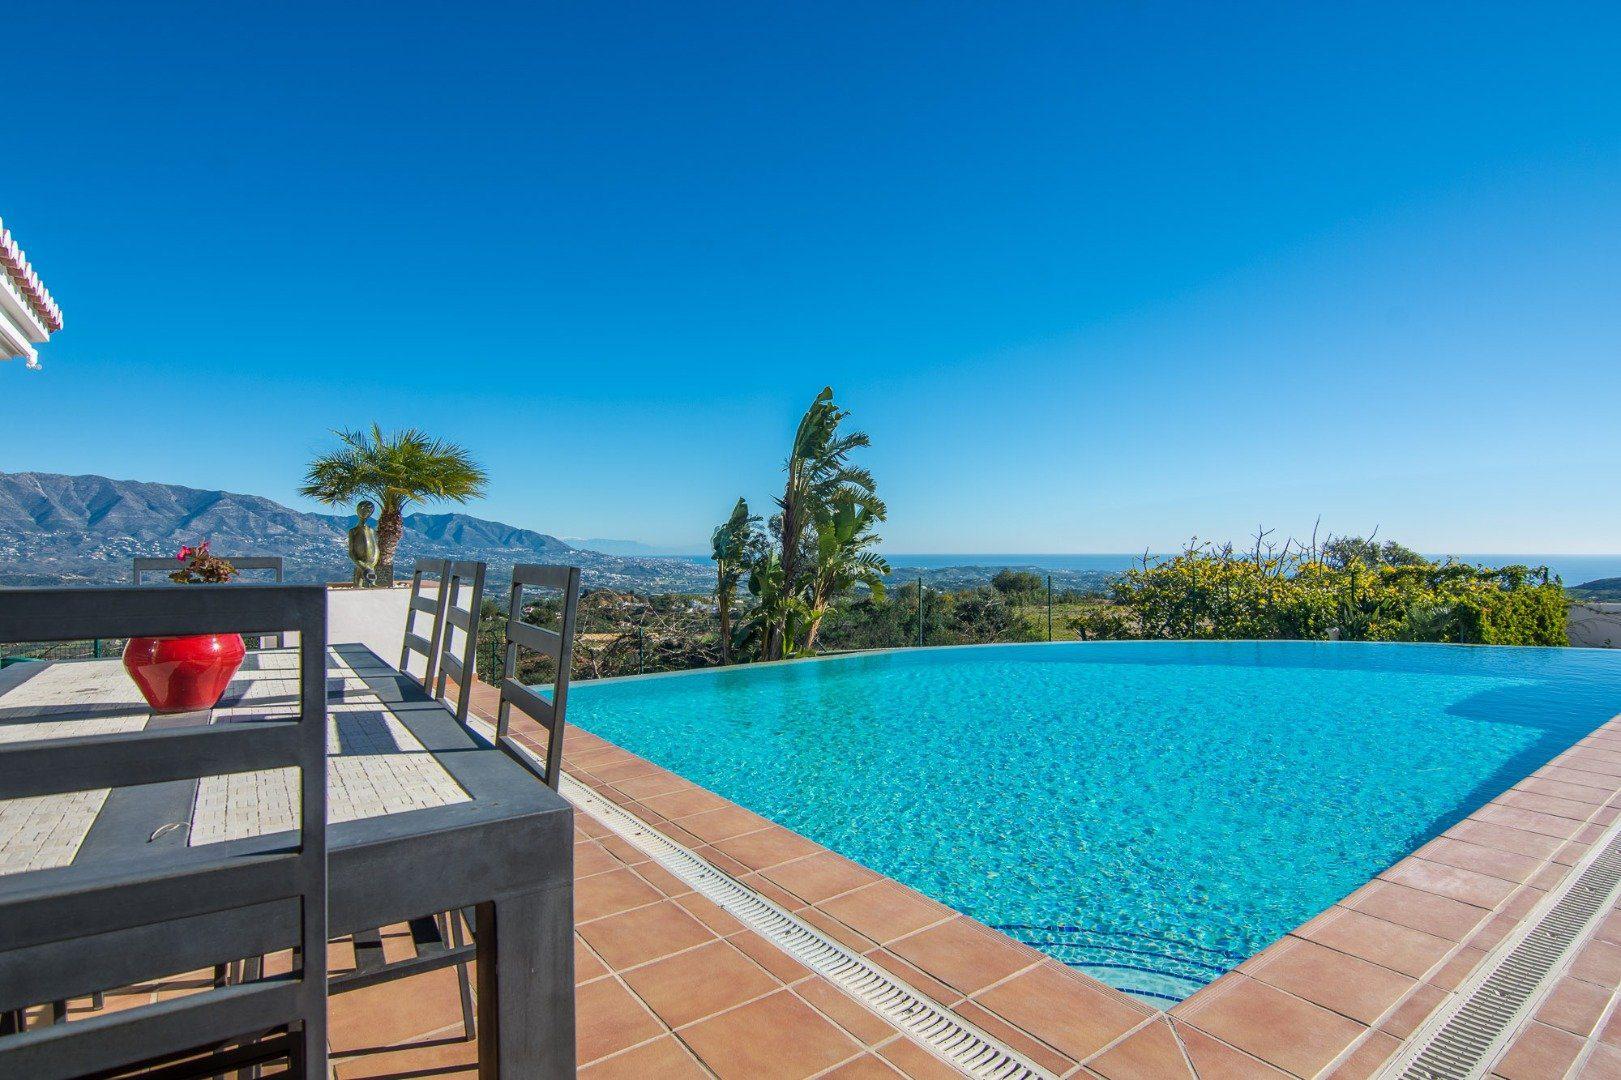 Exclusive 5 bedrooms Villa With Sea Views For Sale In La Mairena, Ojen